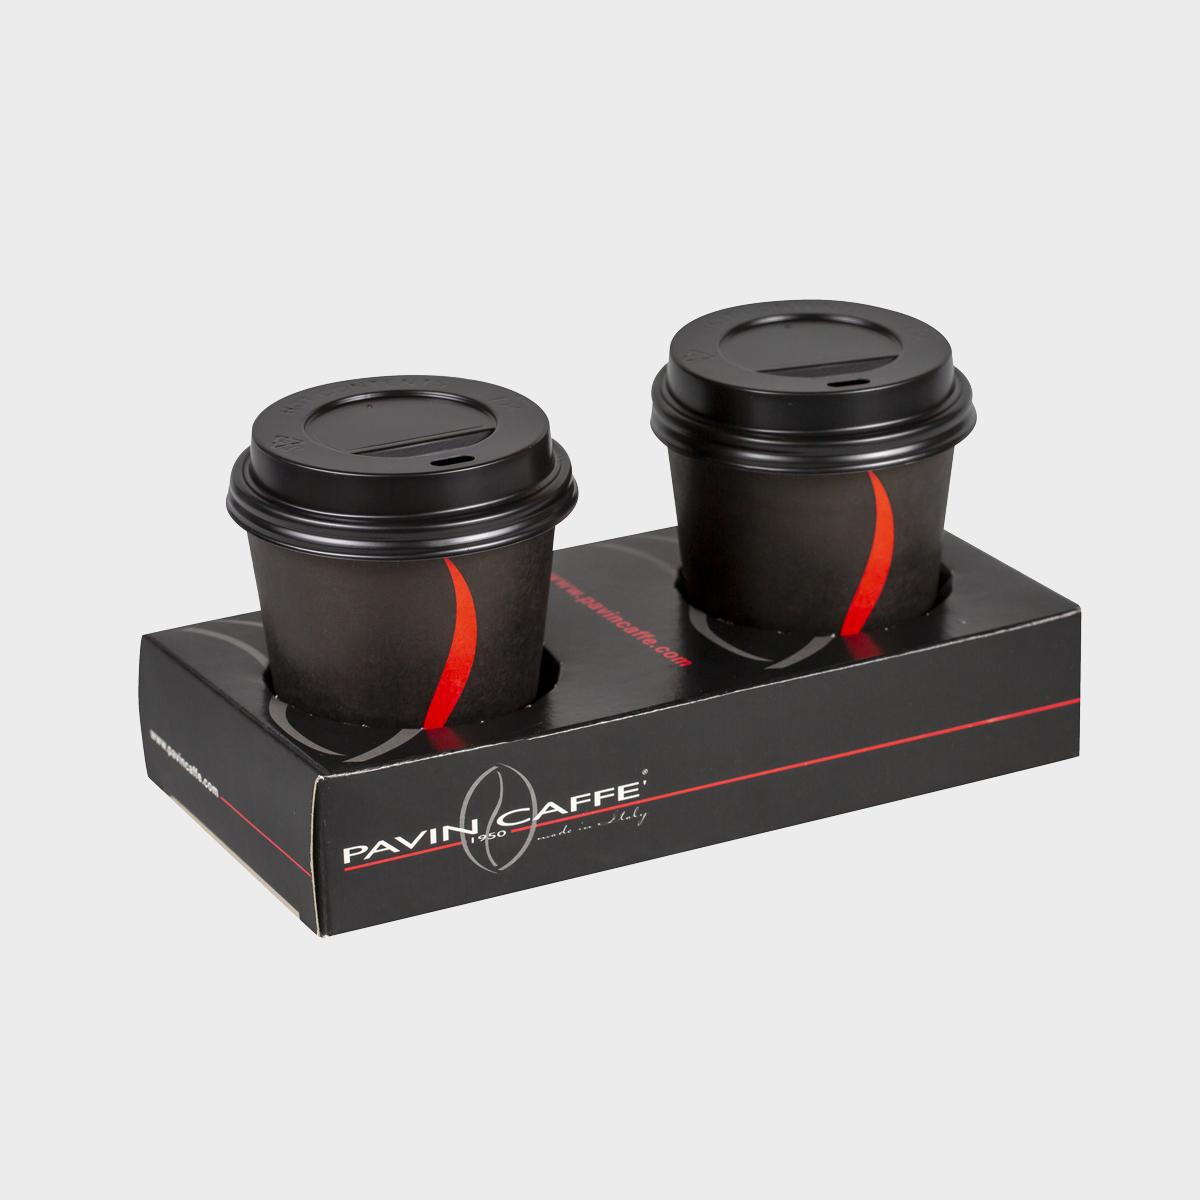 vassoio-takeaway-caffe-pavin